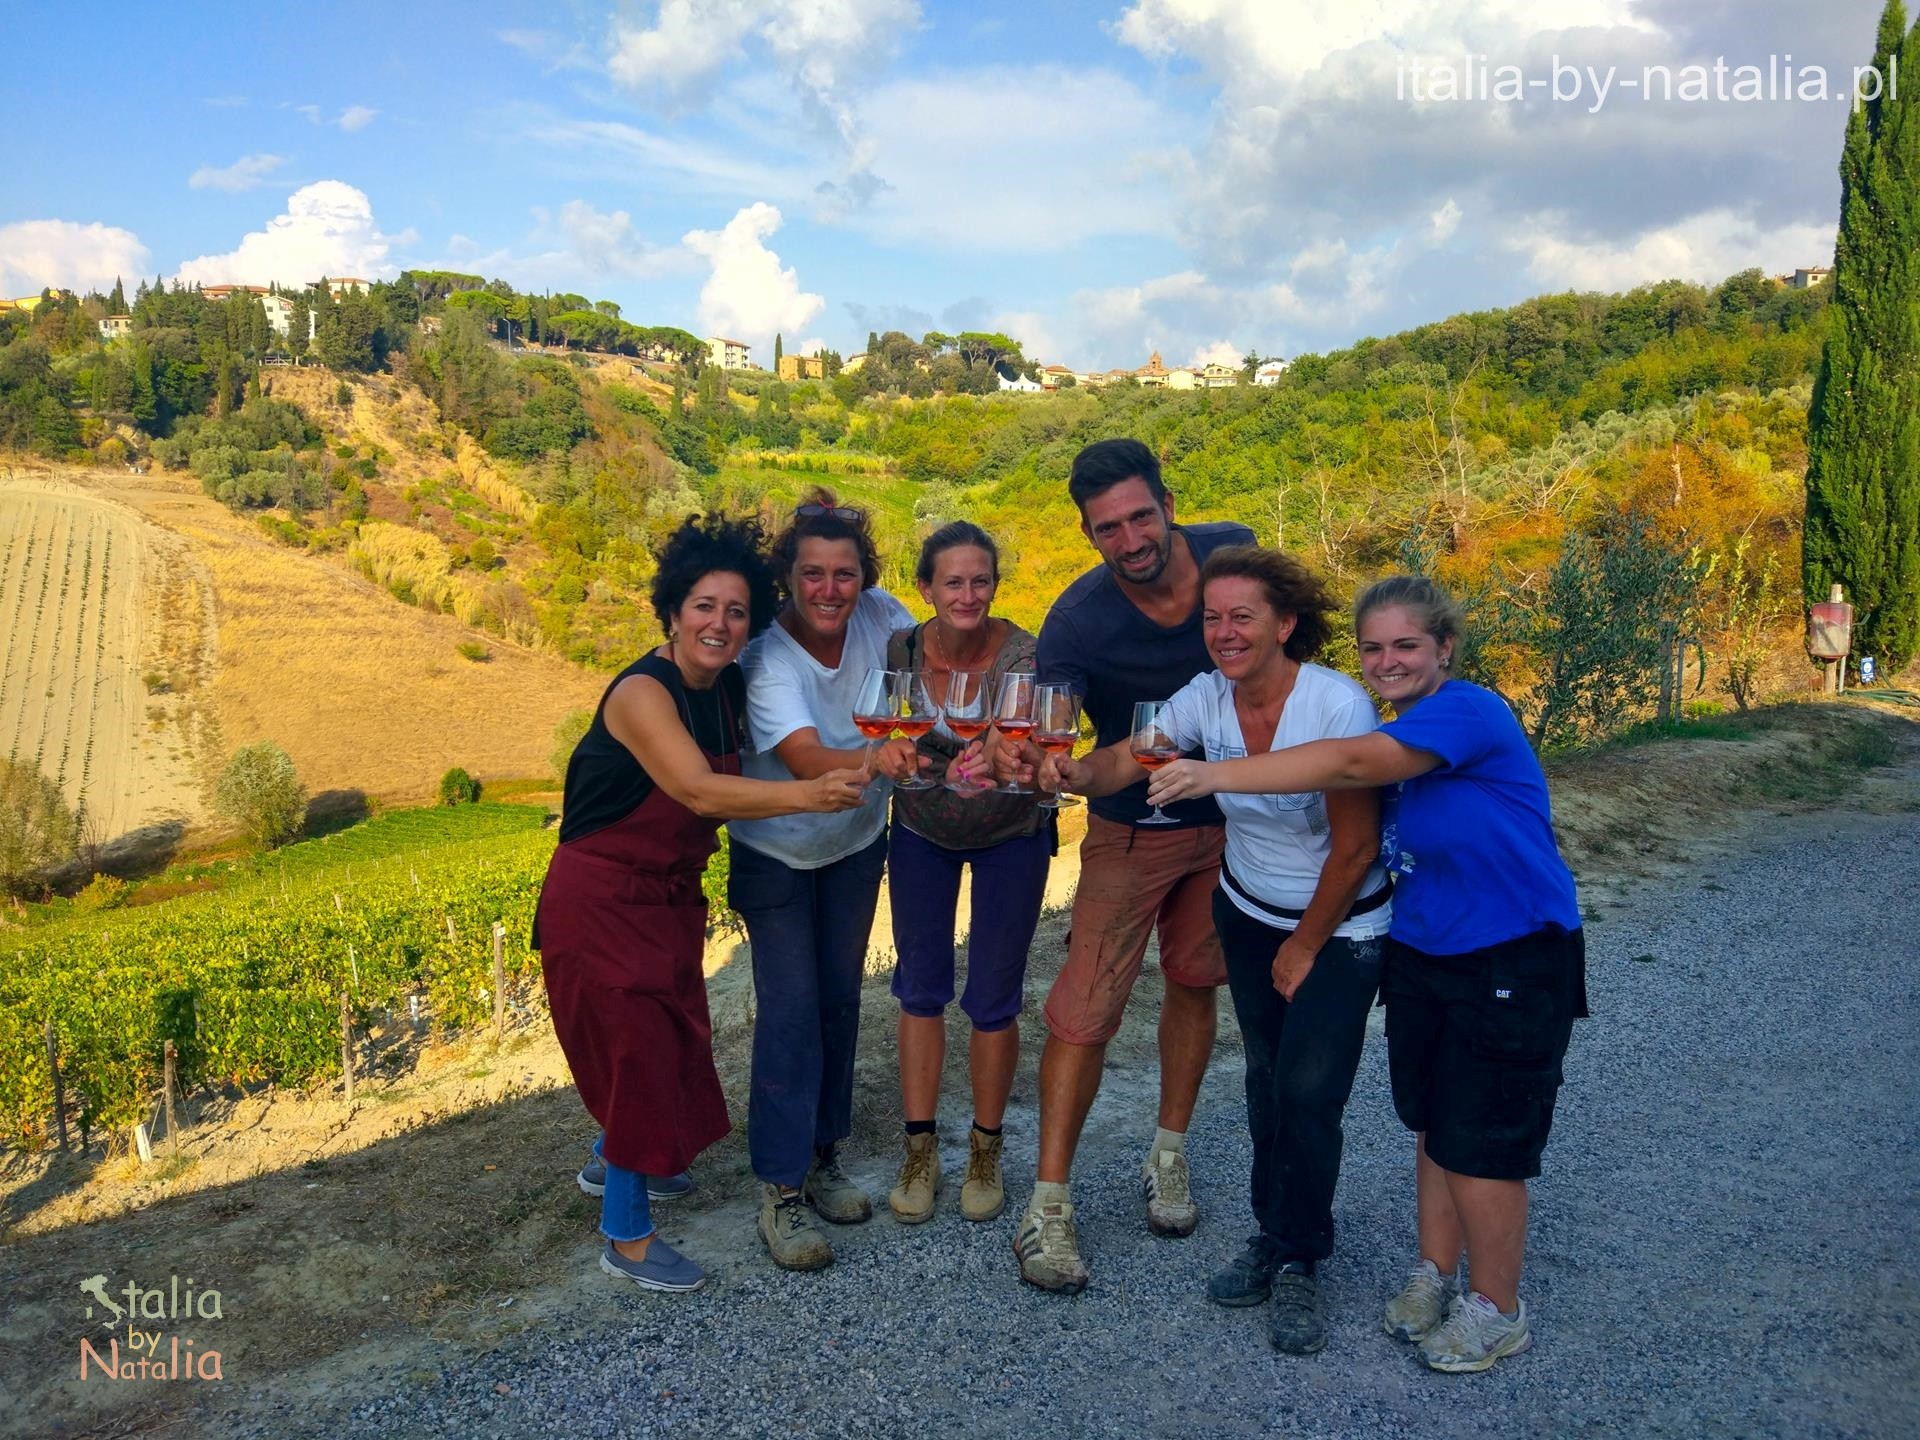 castelvecchio winnica winobranie Toskania jesienią